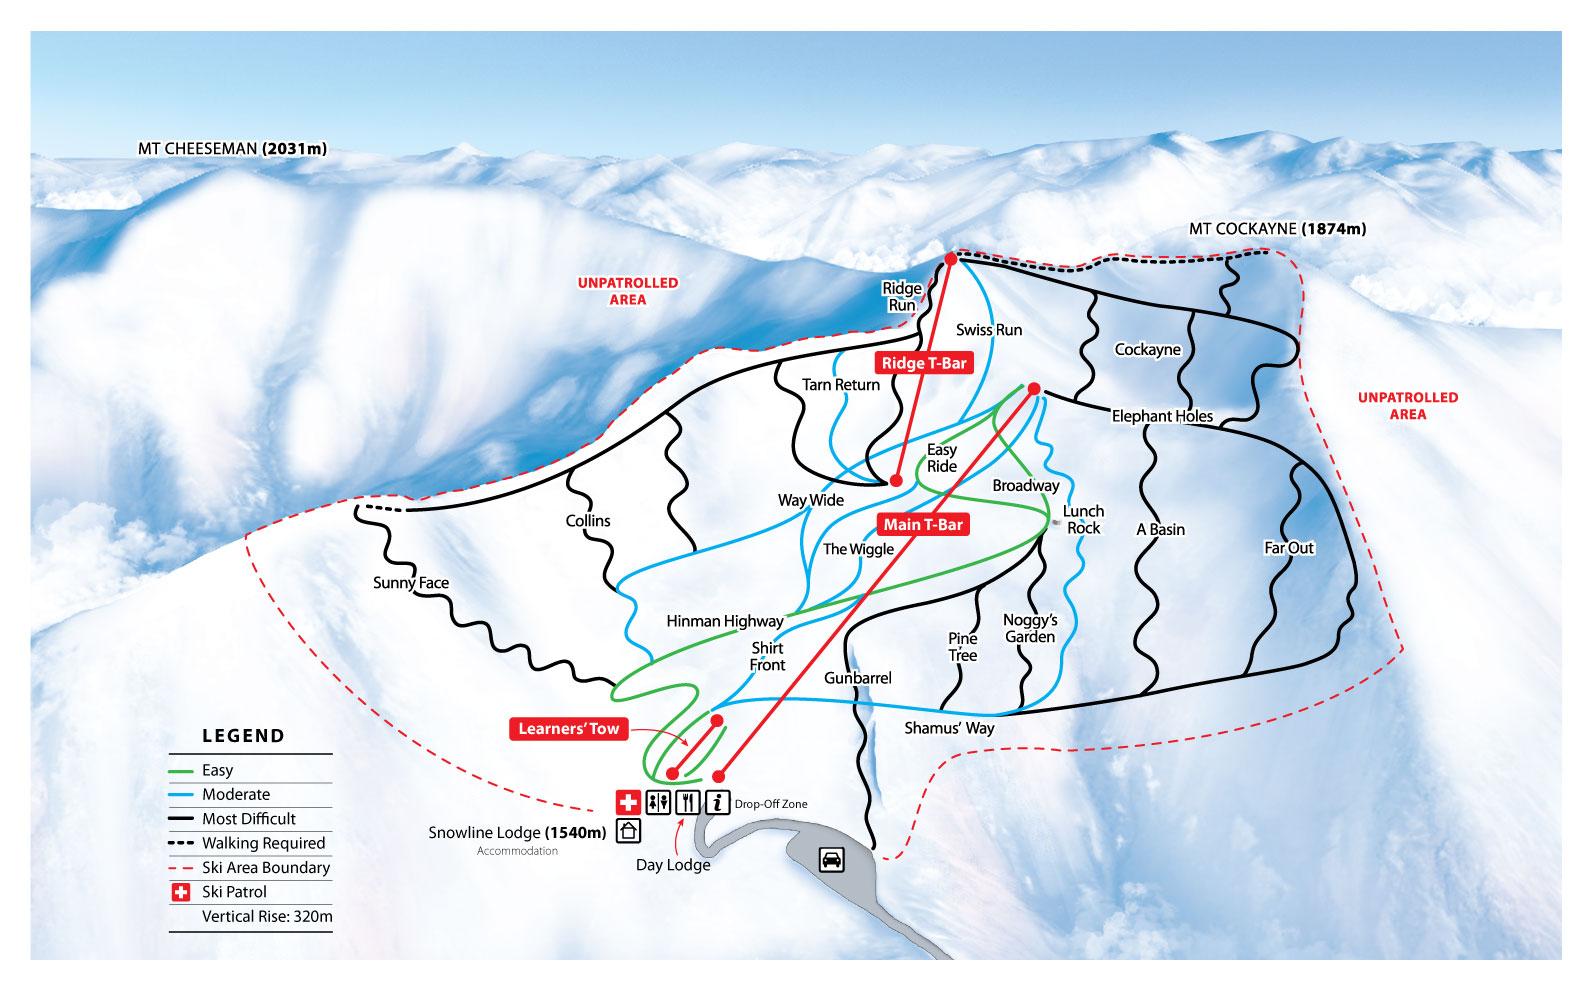 Mount Cheeseman Piste / Trail Map